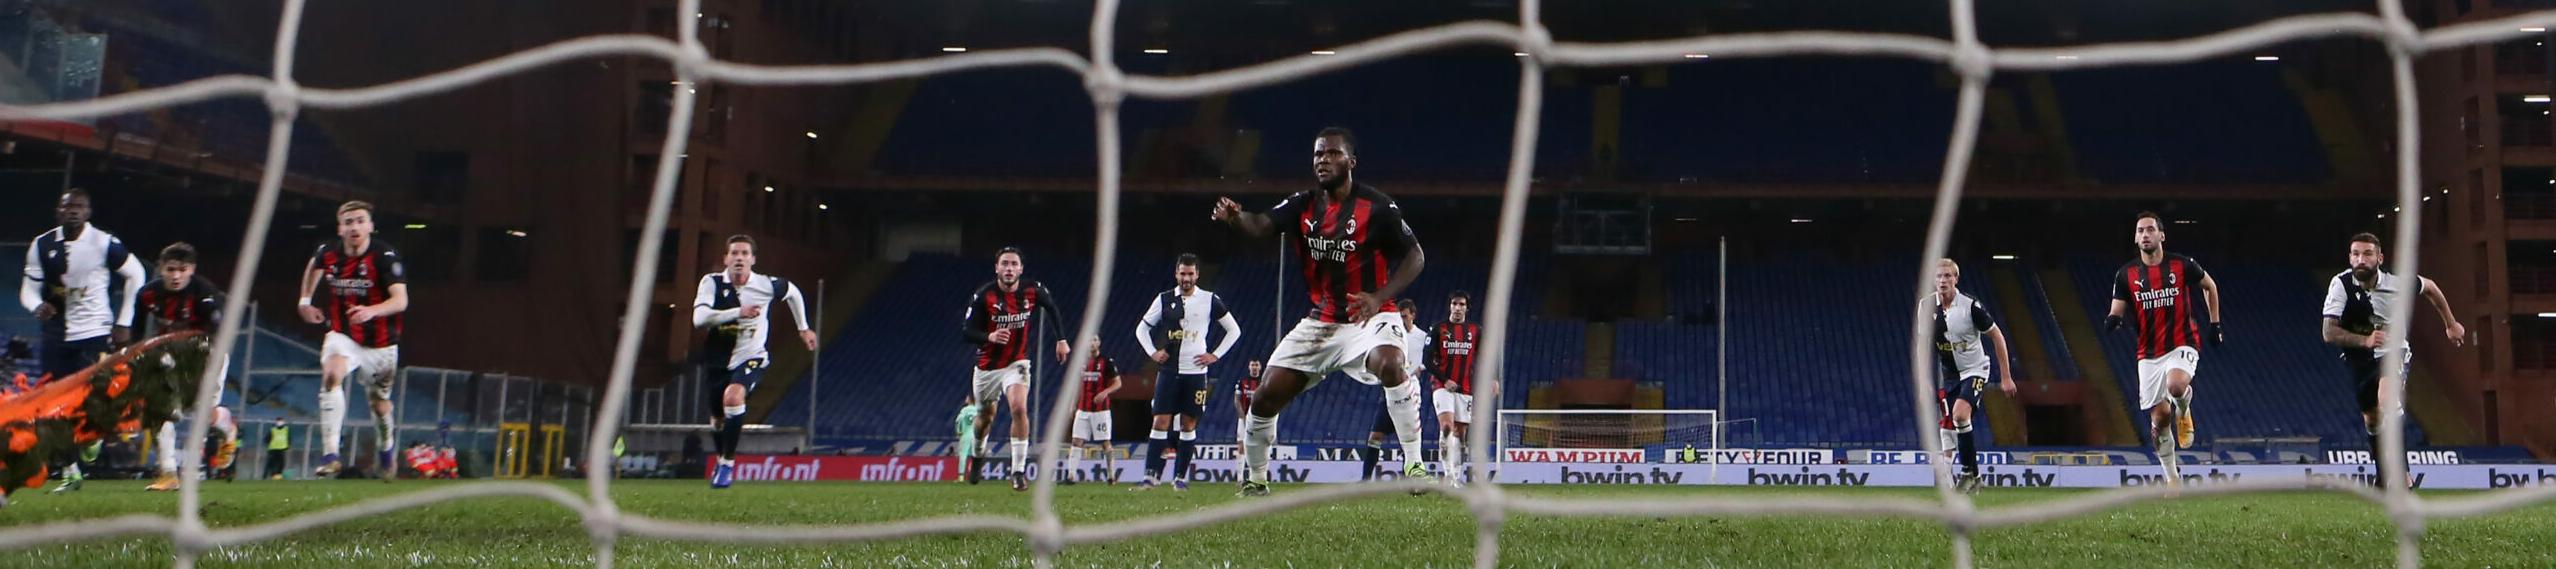 Milan-Sampdoria: tanti recuperi per Pioli, Ranieri perde Ekdal?